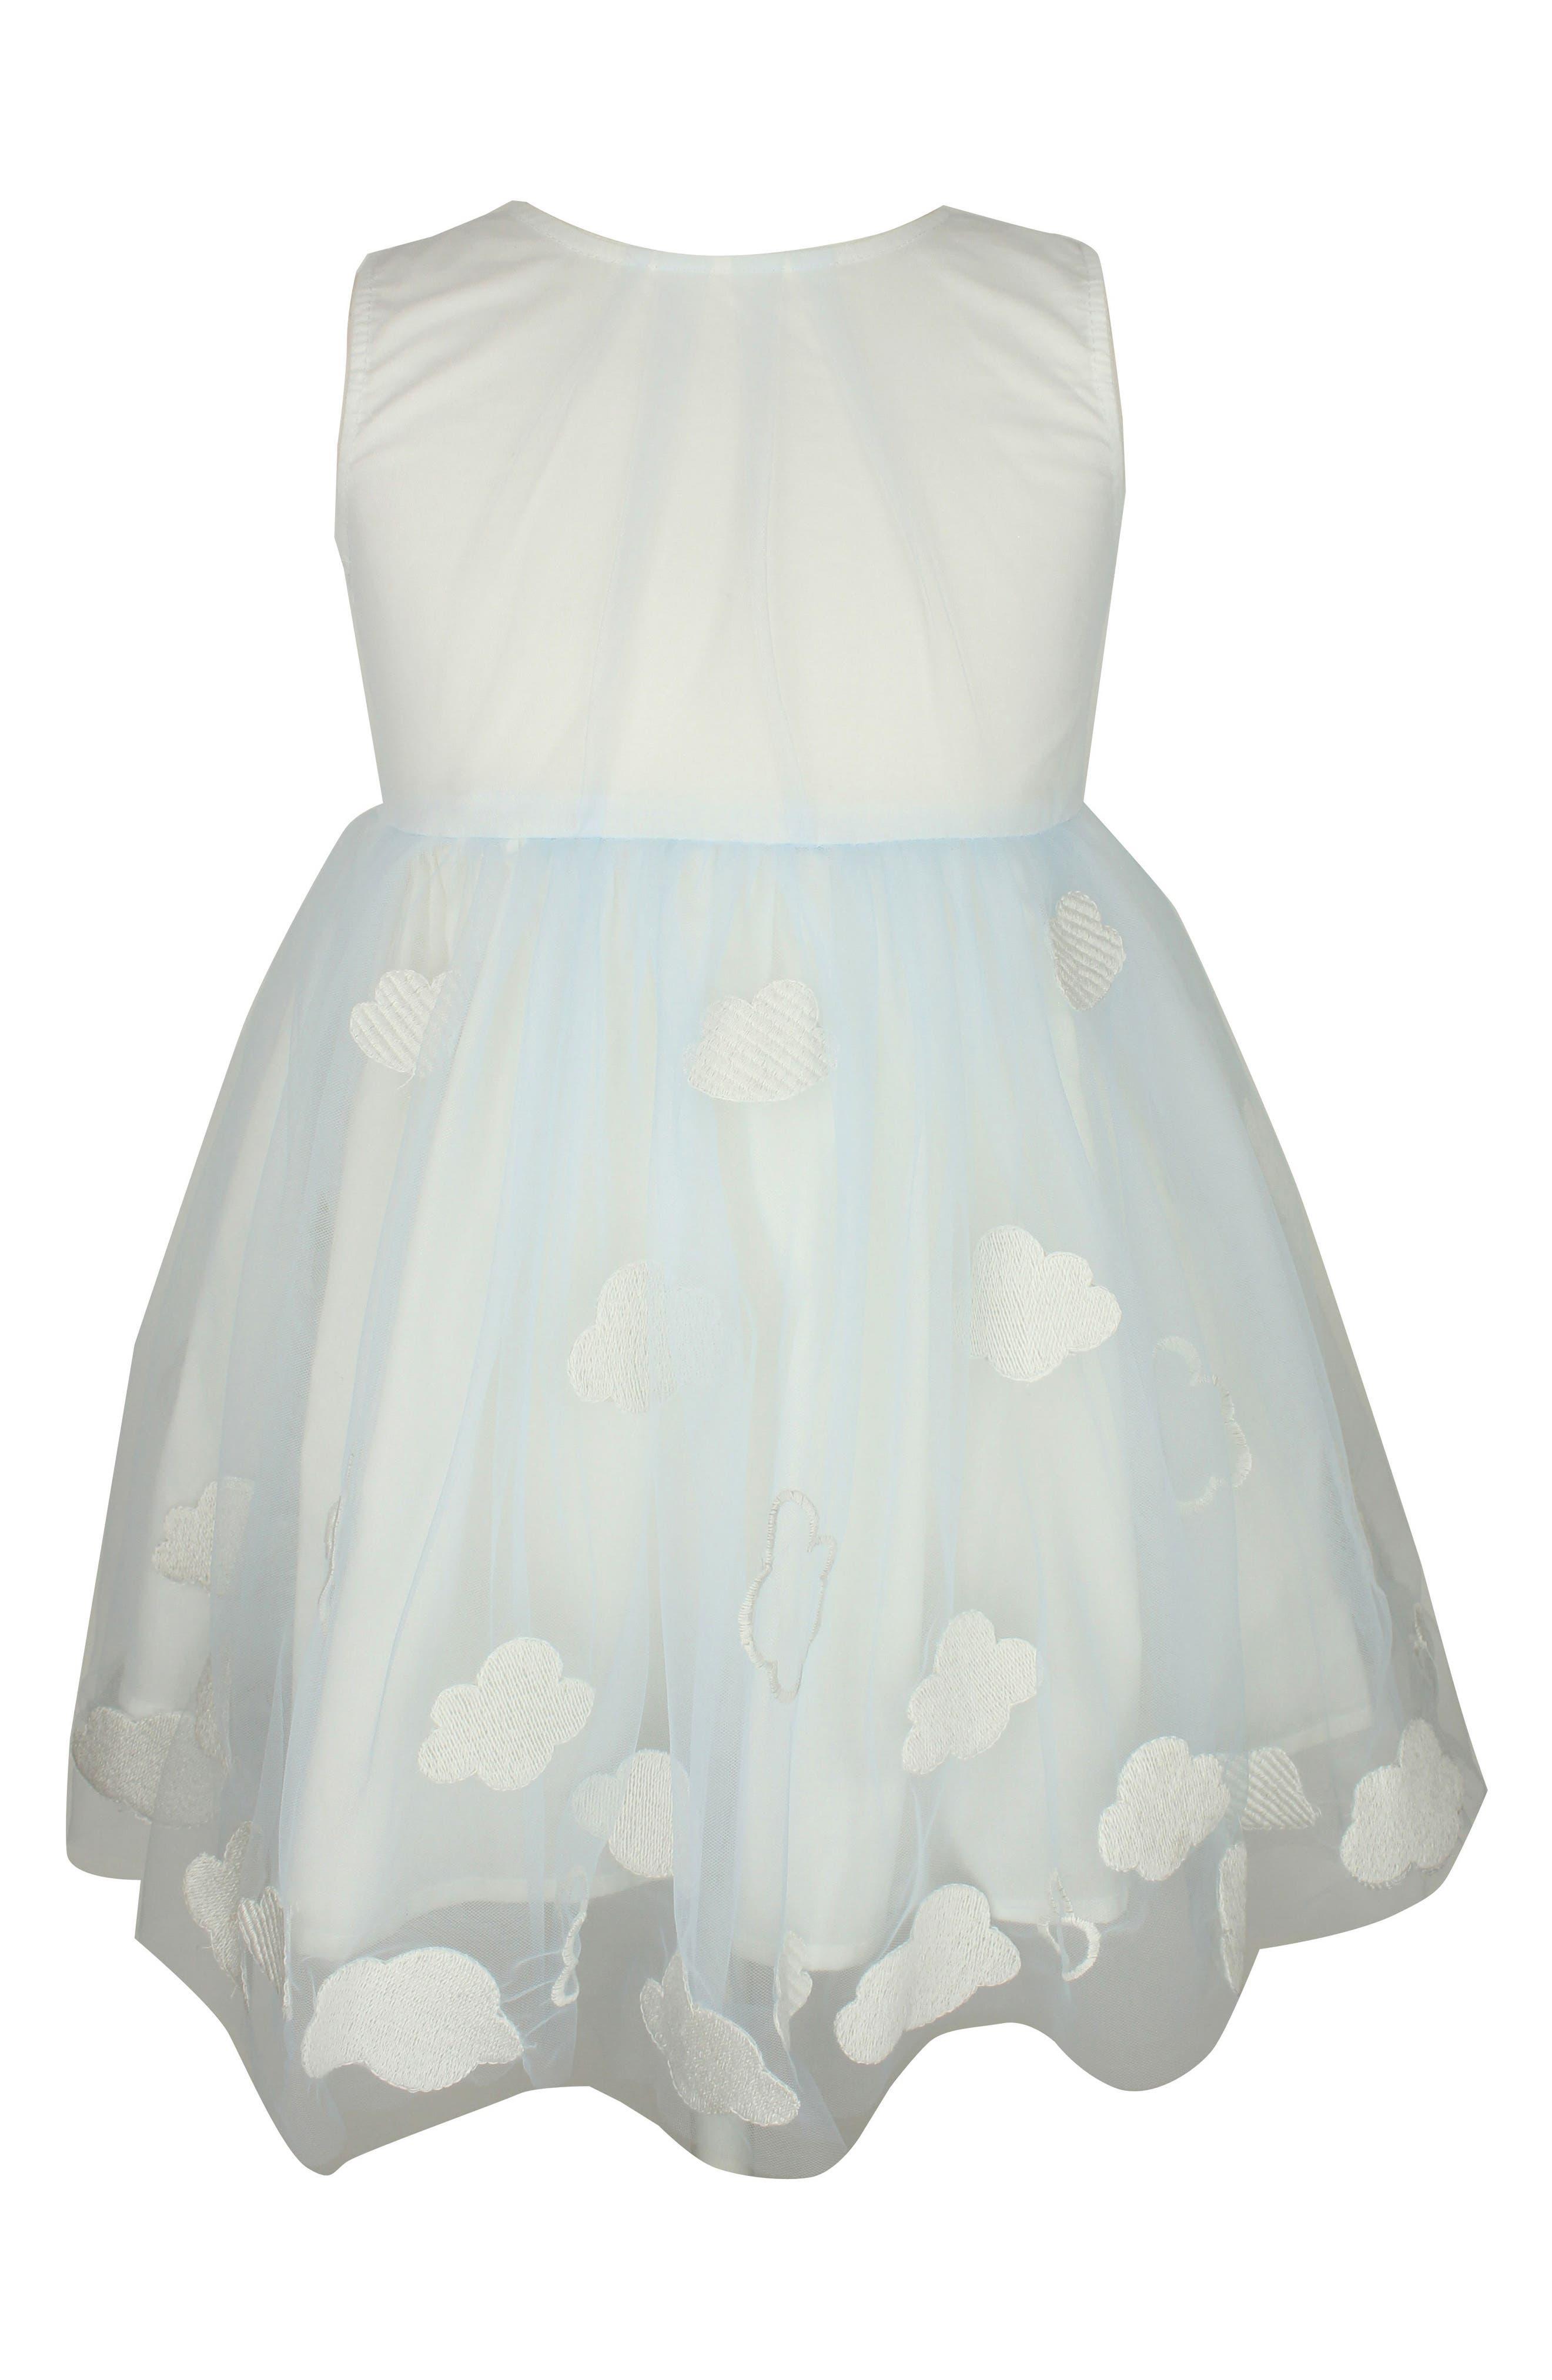 Alternate Image 1 Selected - Popatu Embroidered Cloud Dress (Toddler Girls, Little Girls & Big Girls)